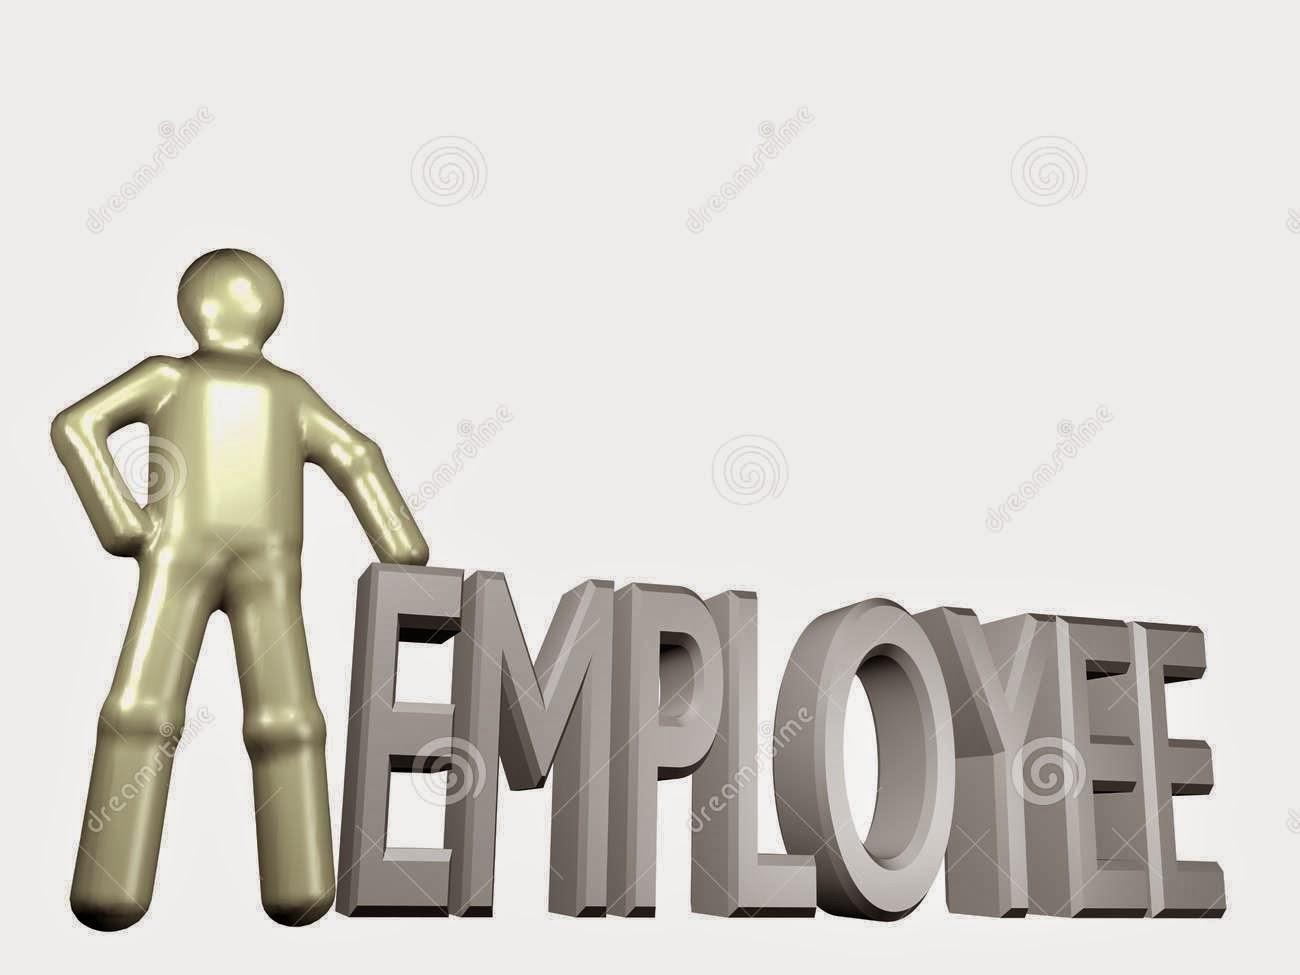 Employee: BEING AN EMPLOYEE SUCKS